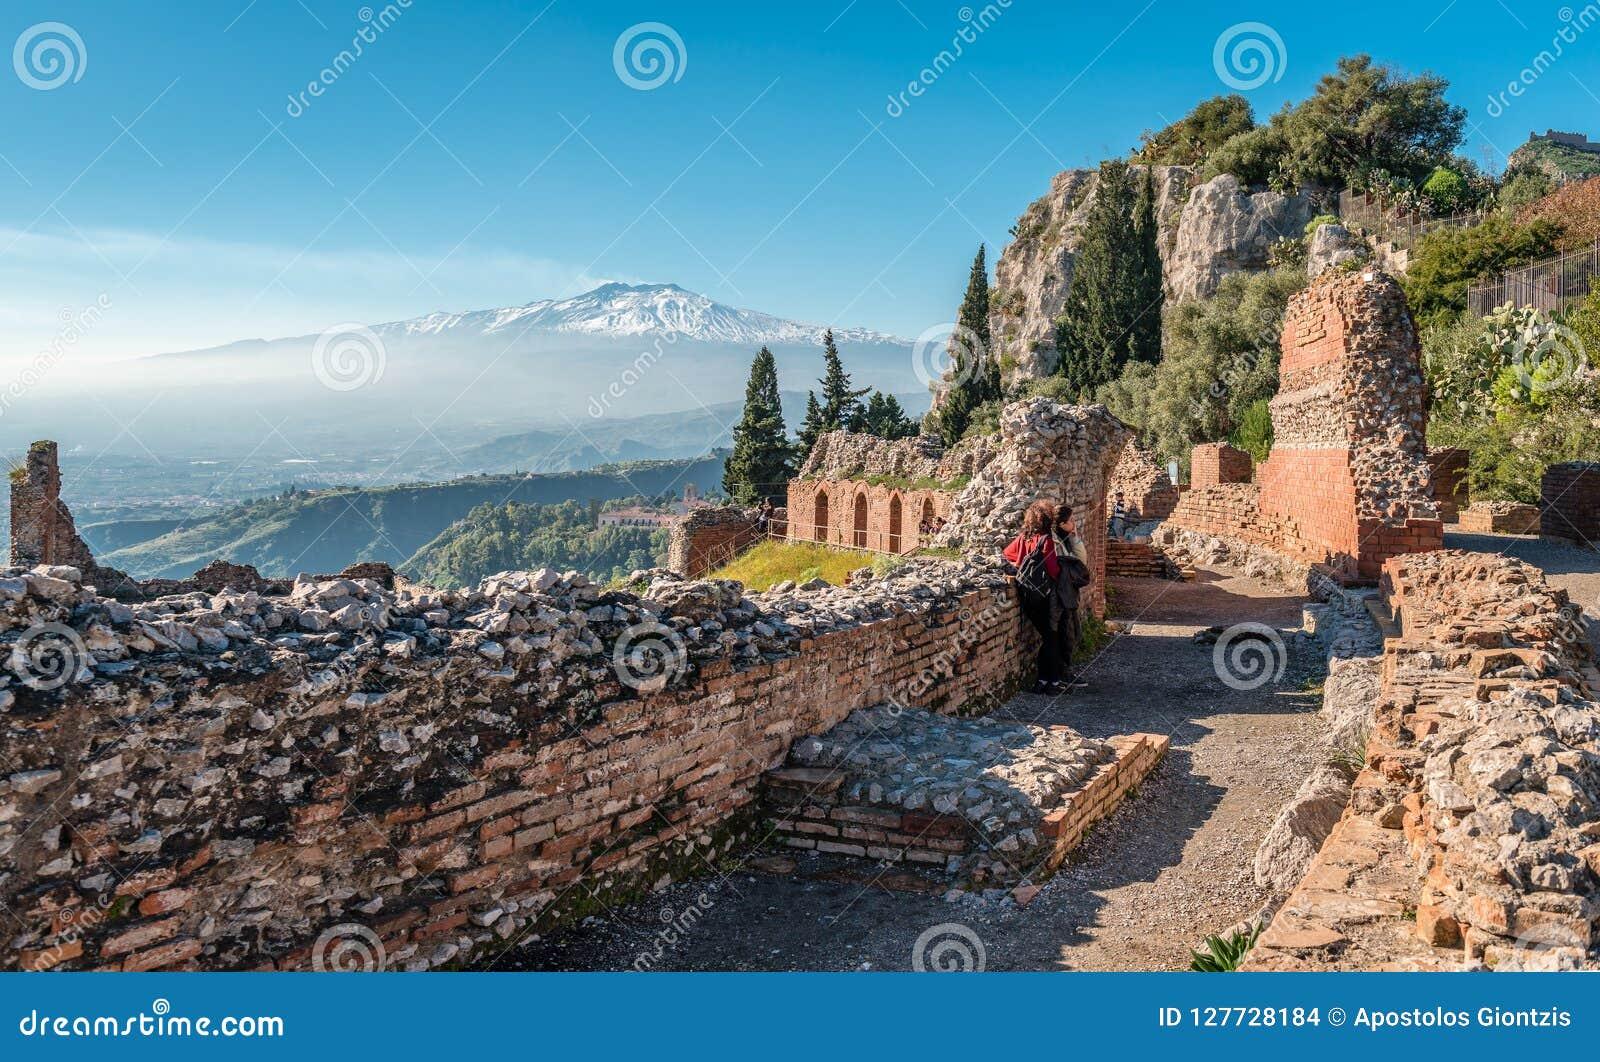 Mount Etna, from Teatro Greco, in Taormina.